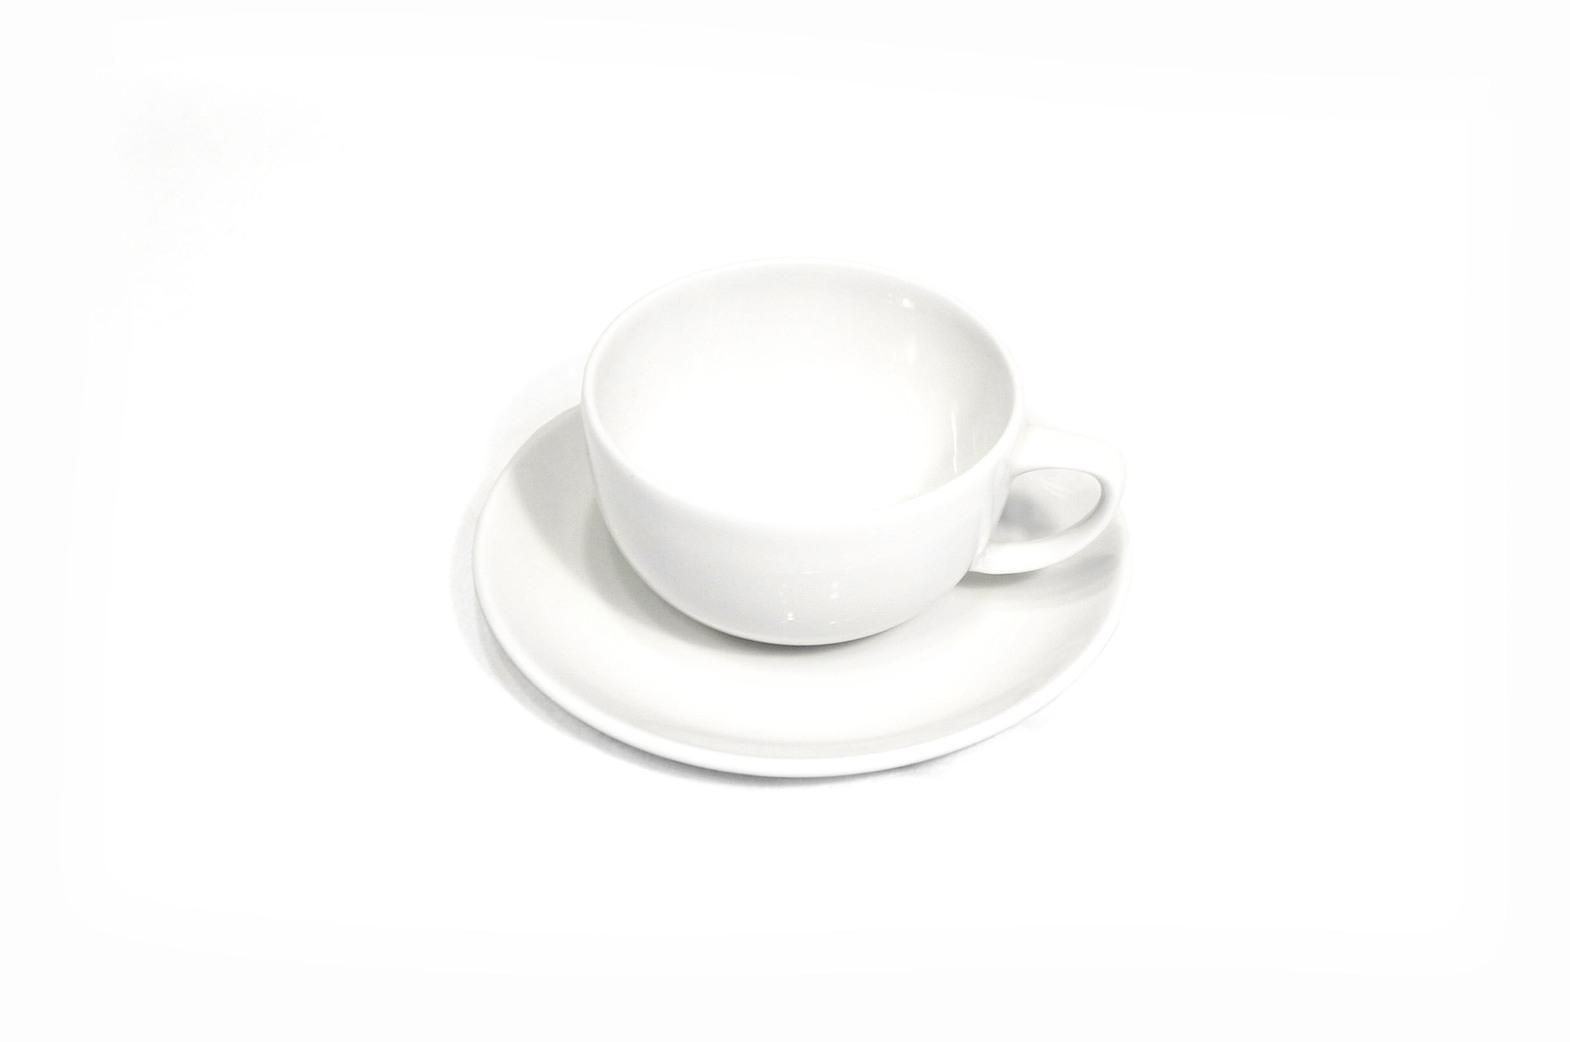 Royal Copenhagen WHITE POTCup and Saucer/ロイヤルコペンハーゲン ホワイトポット カップ&ソーサー デンマーク 北欧食器